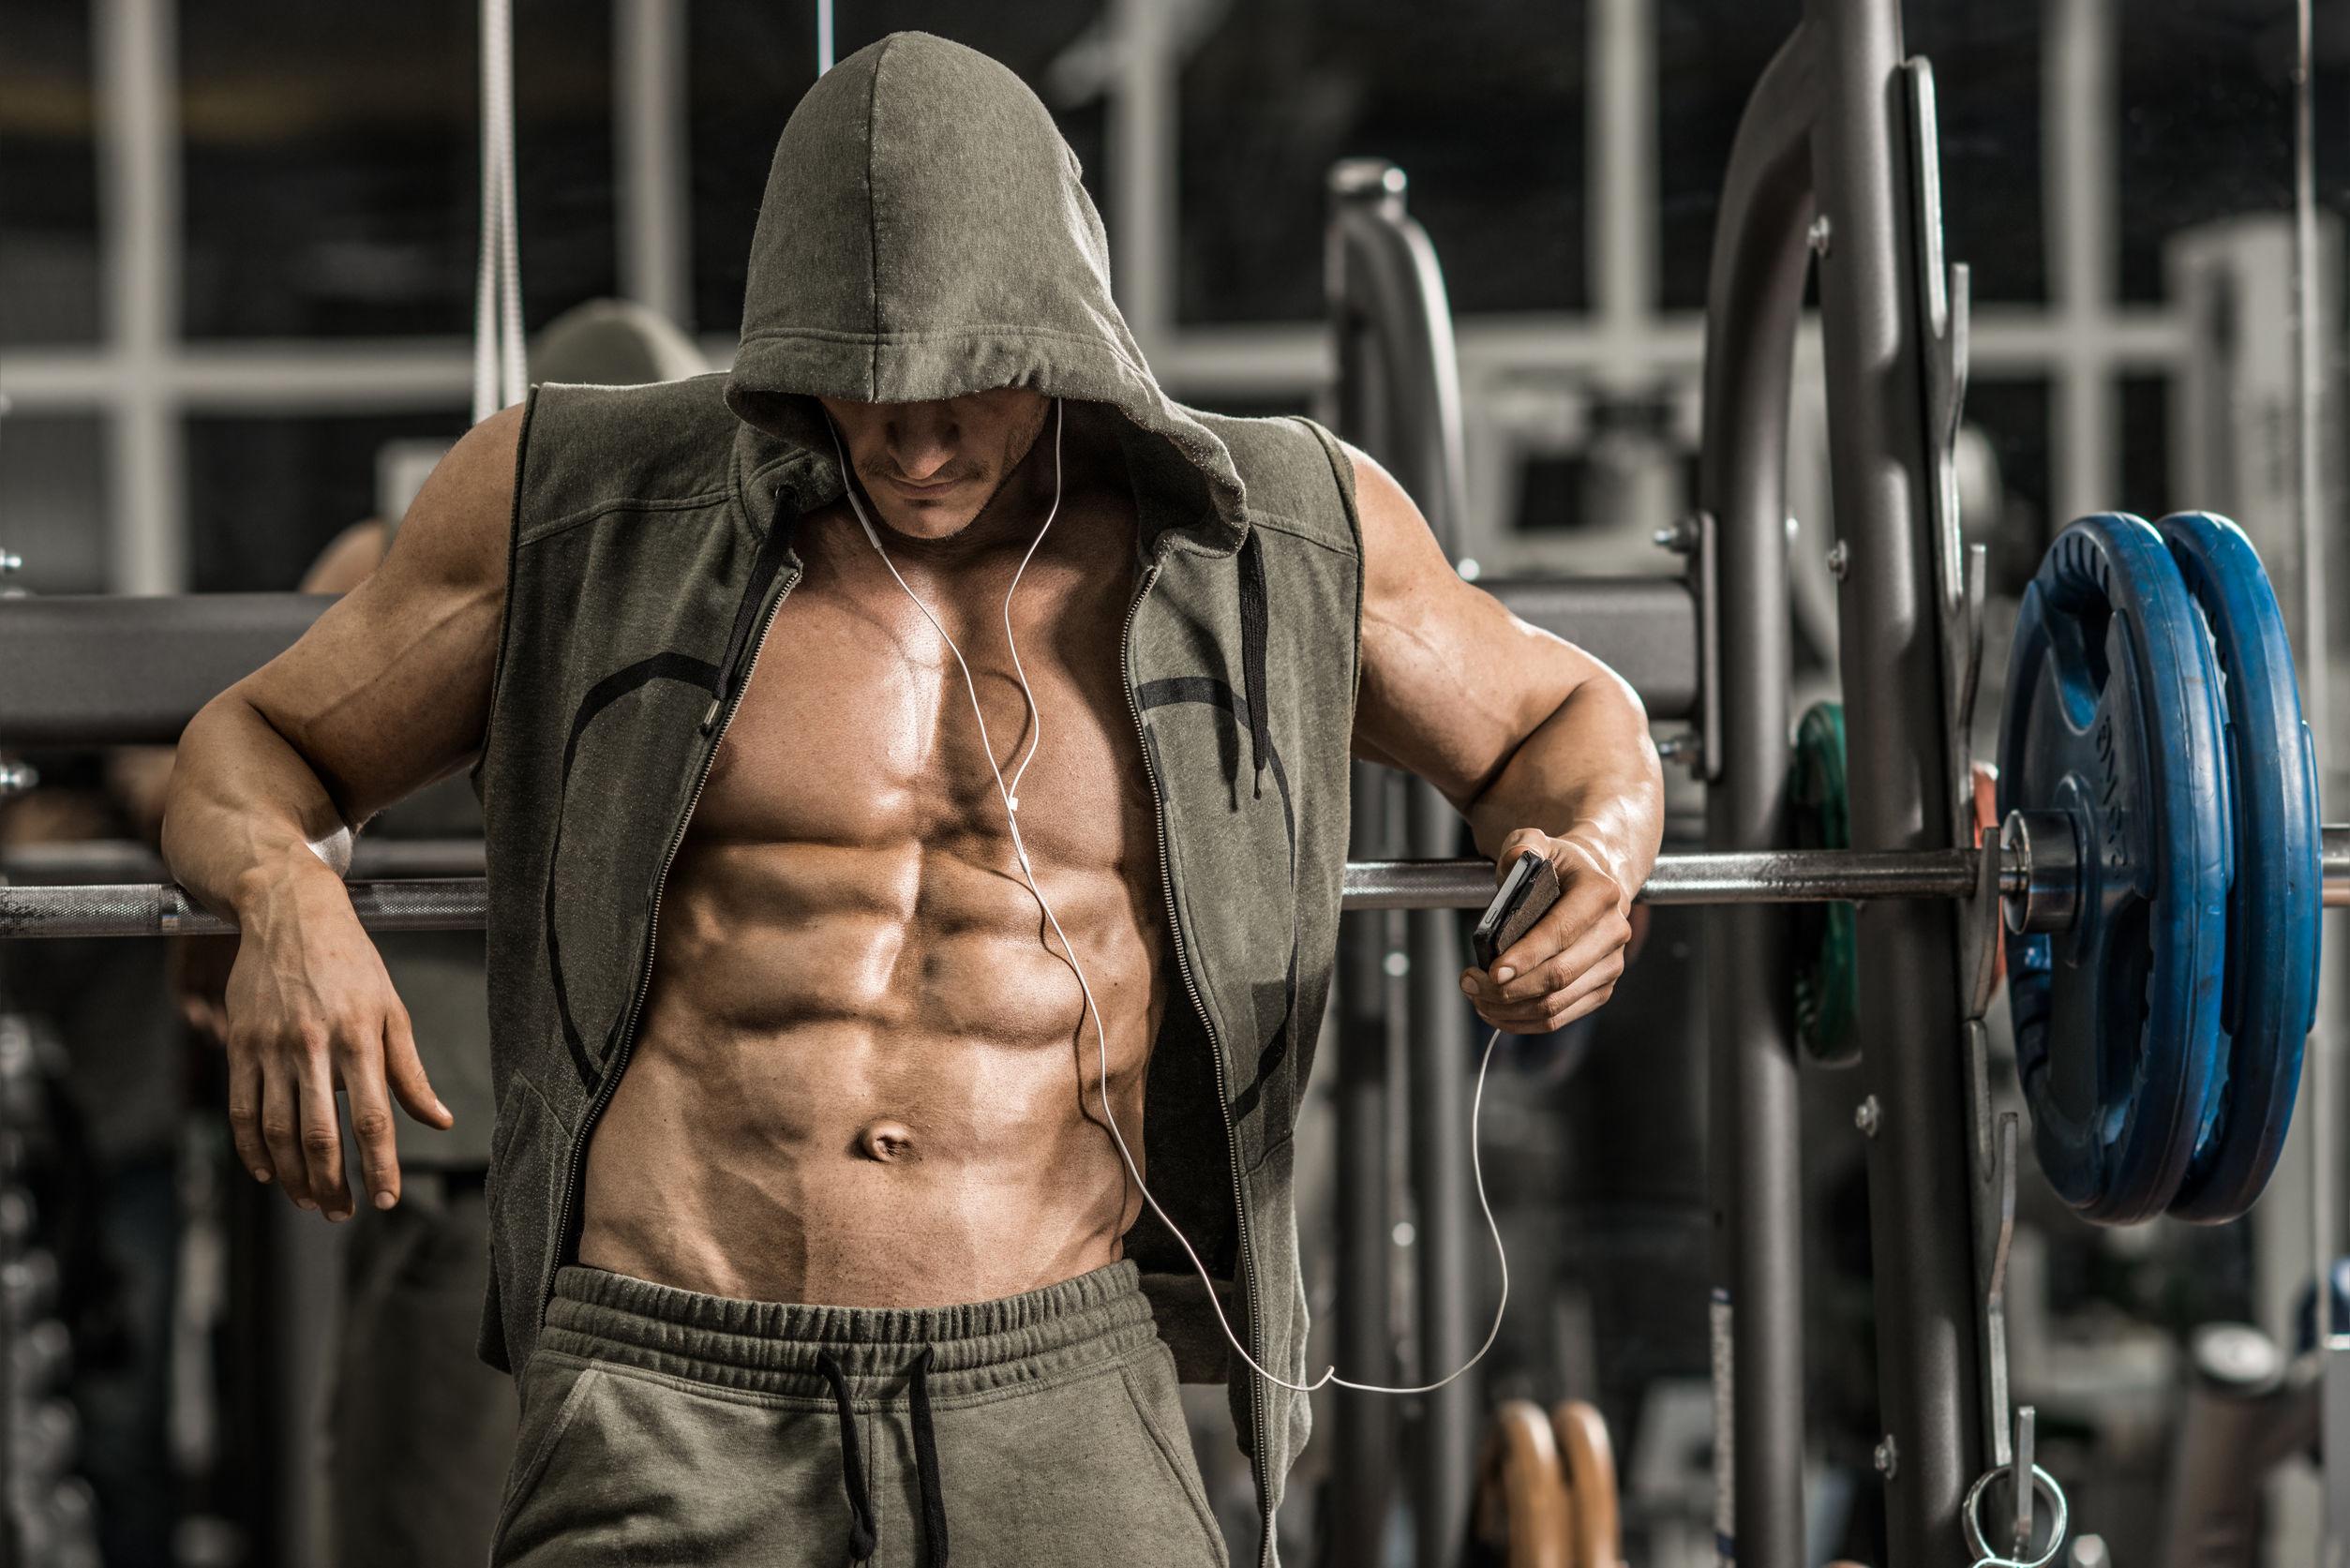 Arme muskelaufbau dünne Muskelaufbau für